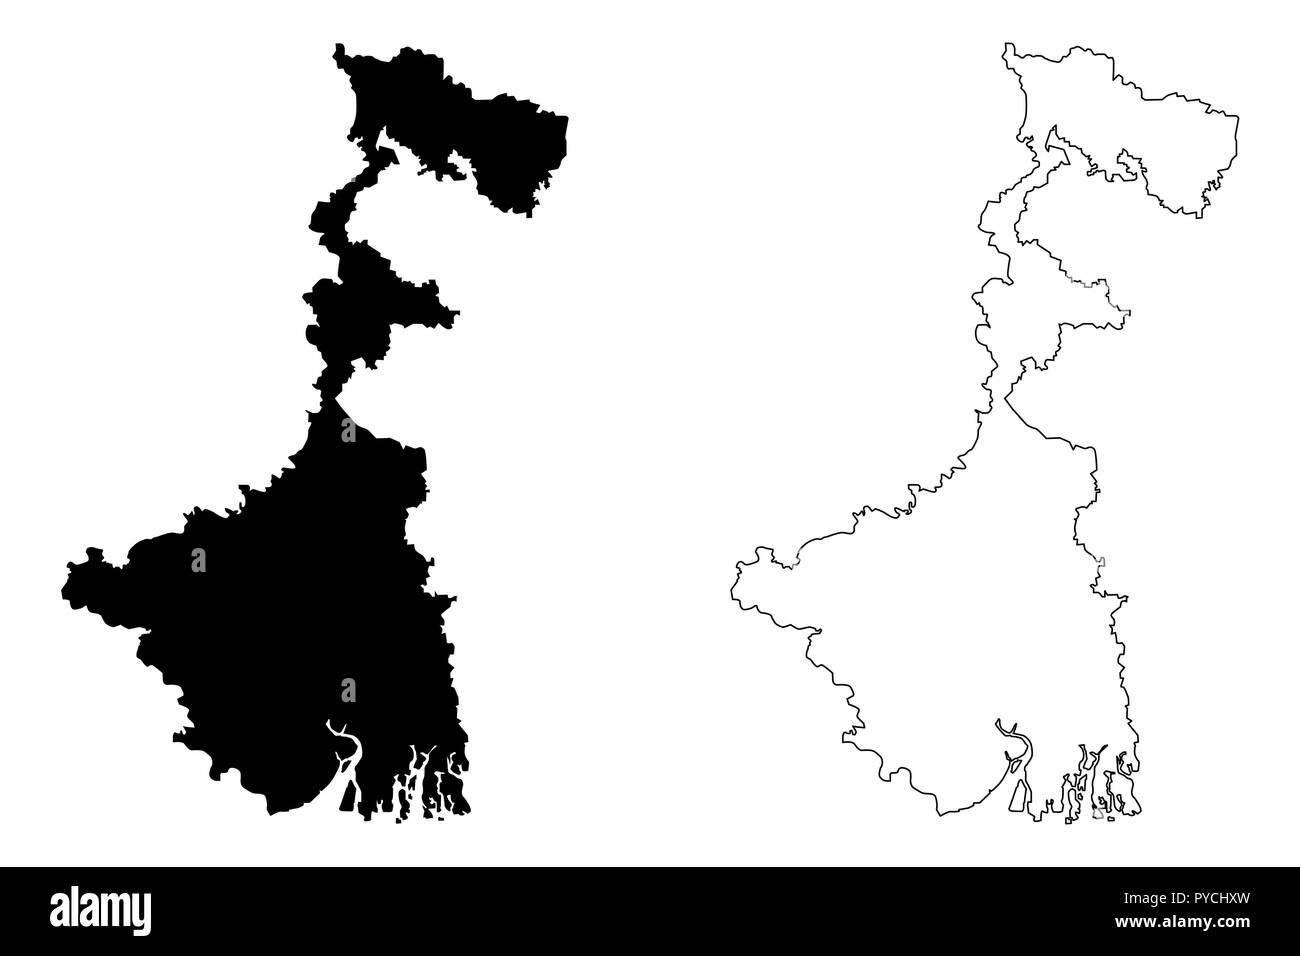 West Bengal Map Stock Photos & West Bengal Map Stock Images ... on maharashtra map, indiana county map, indiana state map, tamil nadu map, cape of good hope map, great britain map, brazil map, iran map, india map, european nations map, u.s. regions map, andhra pradesh map, bangladesh map, illinois-indiana map, indian states and capitals, saudi arabia map, french regions map, cyber world map, state capitals map, tonga map,